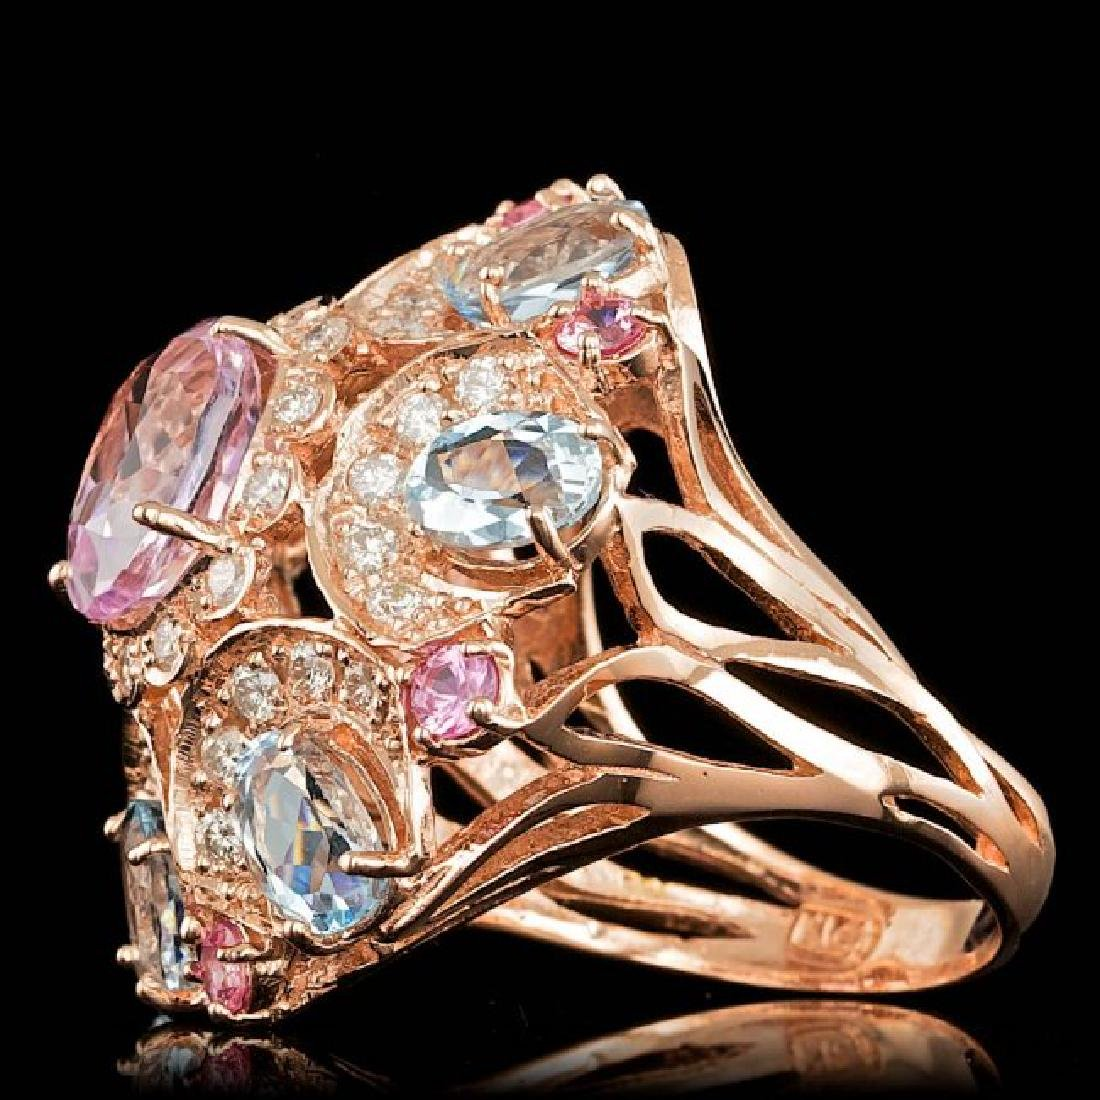 14k Rose Gold 3.50ct Kunzite 1.25ct Diamond Ring - 2